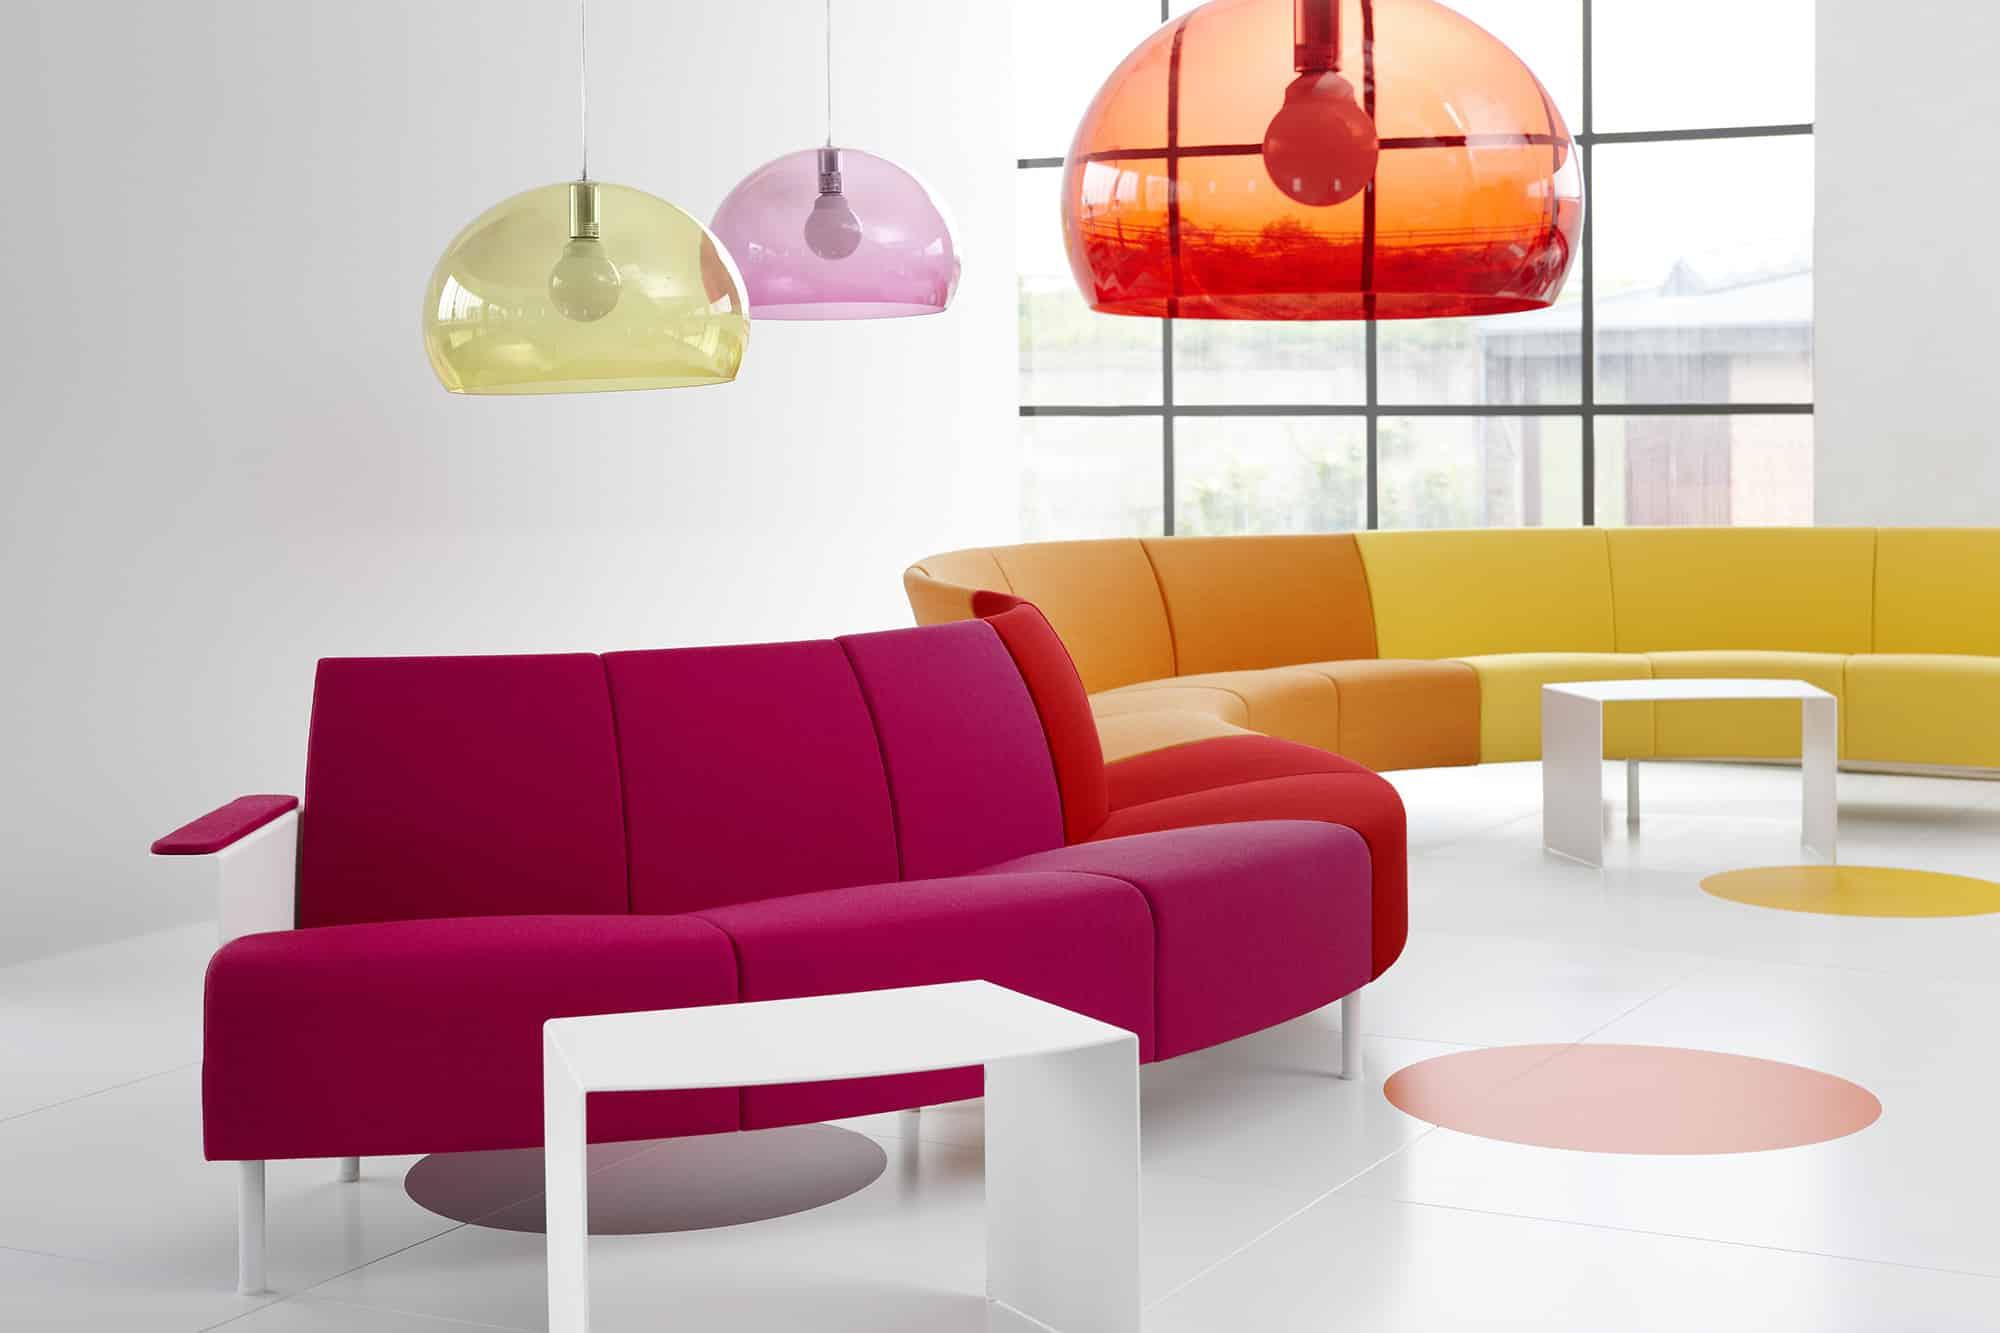 Swedish Design Goes Milan 8-14 of April 2013